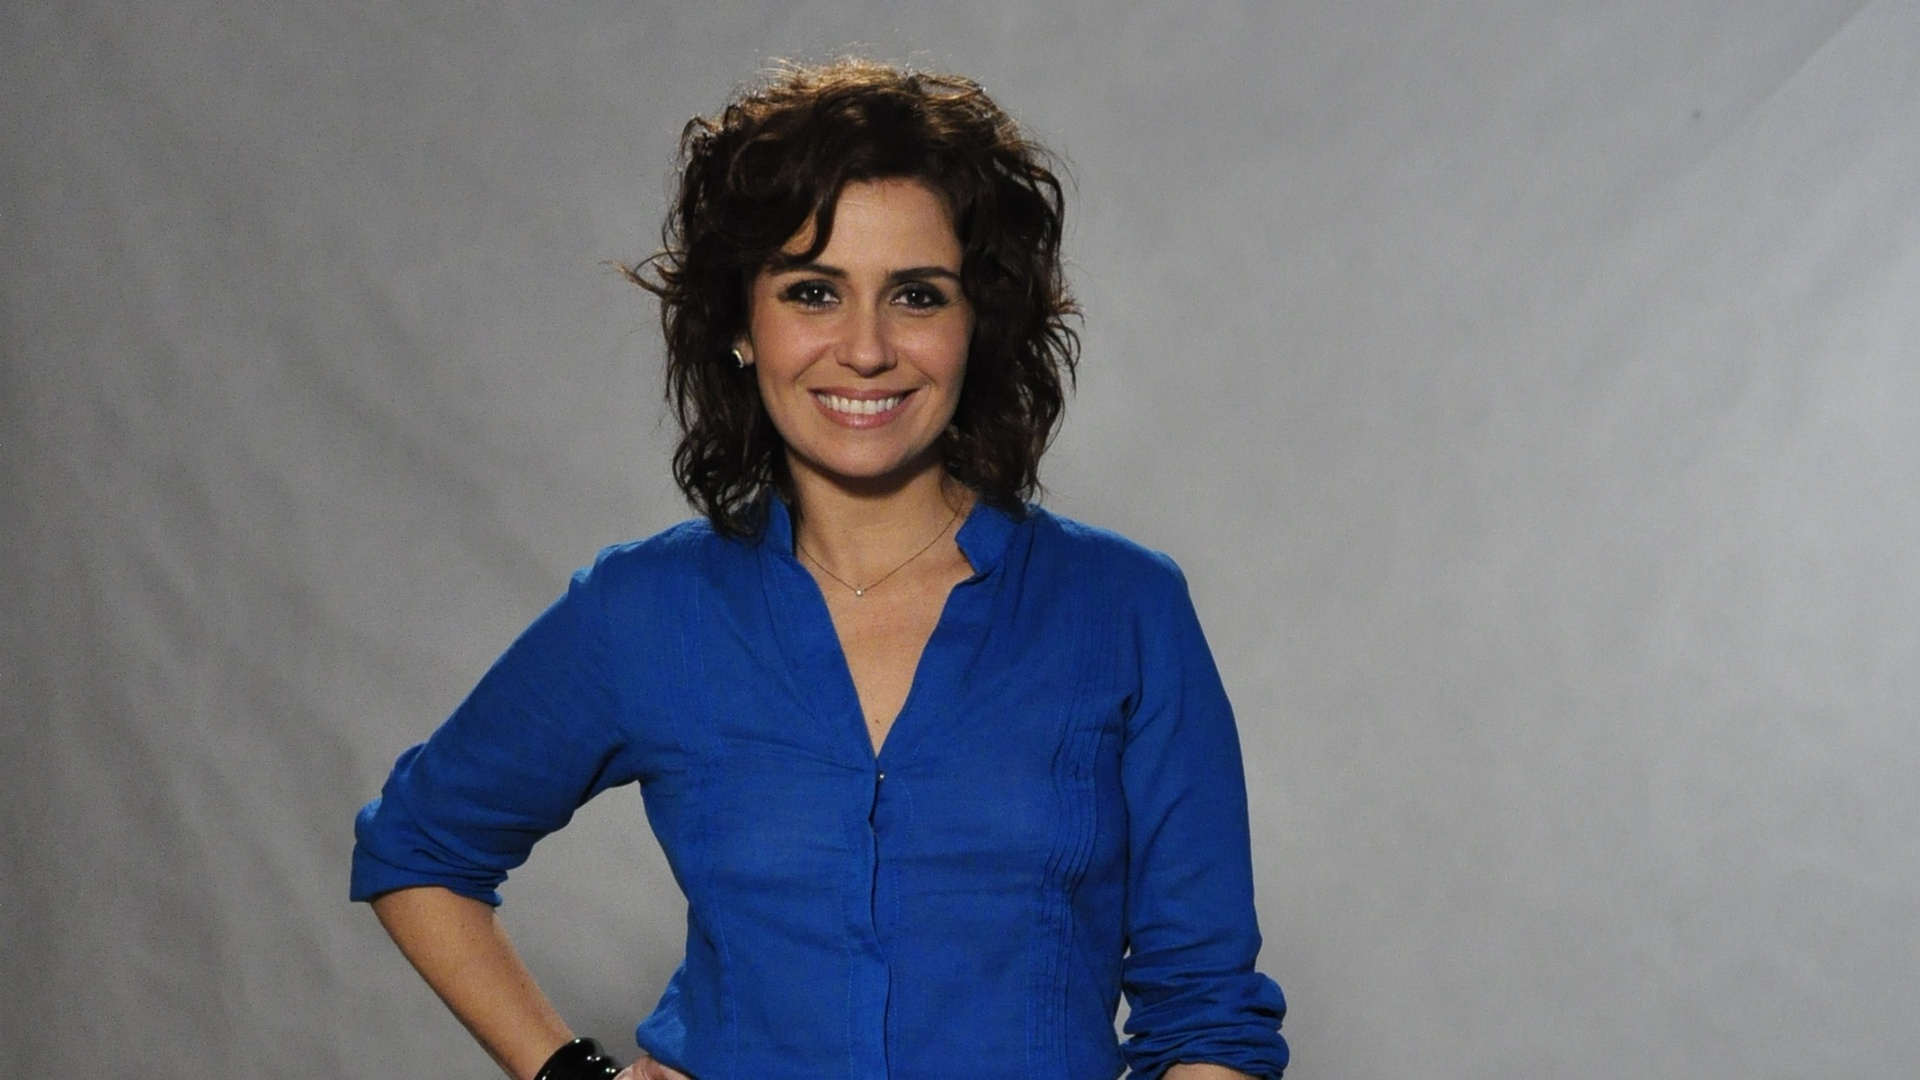 Giovanna Antonelli na coletiva de imprensa da novela